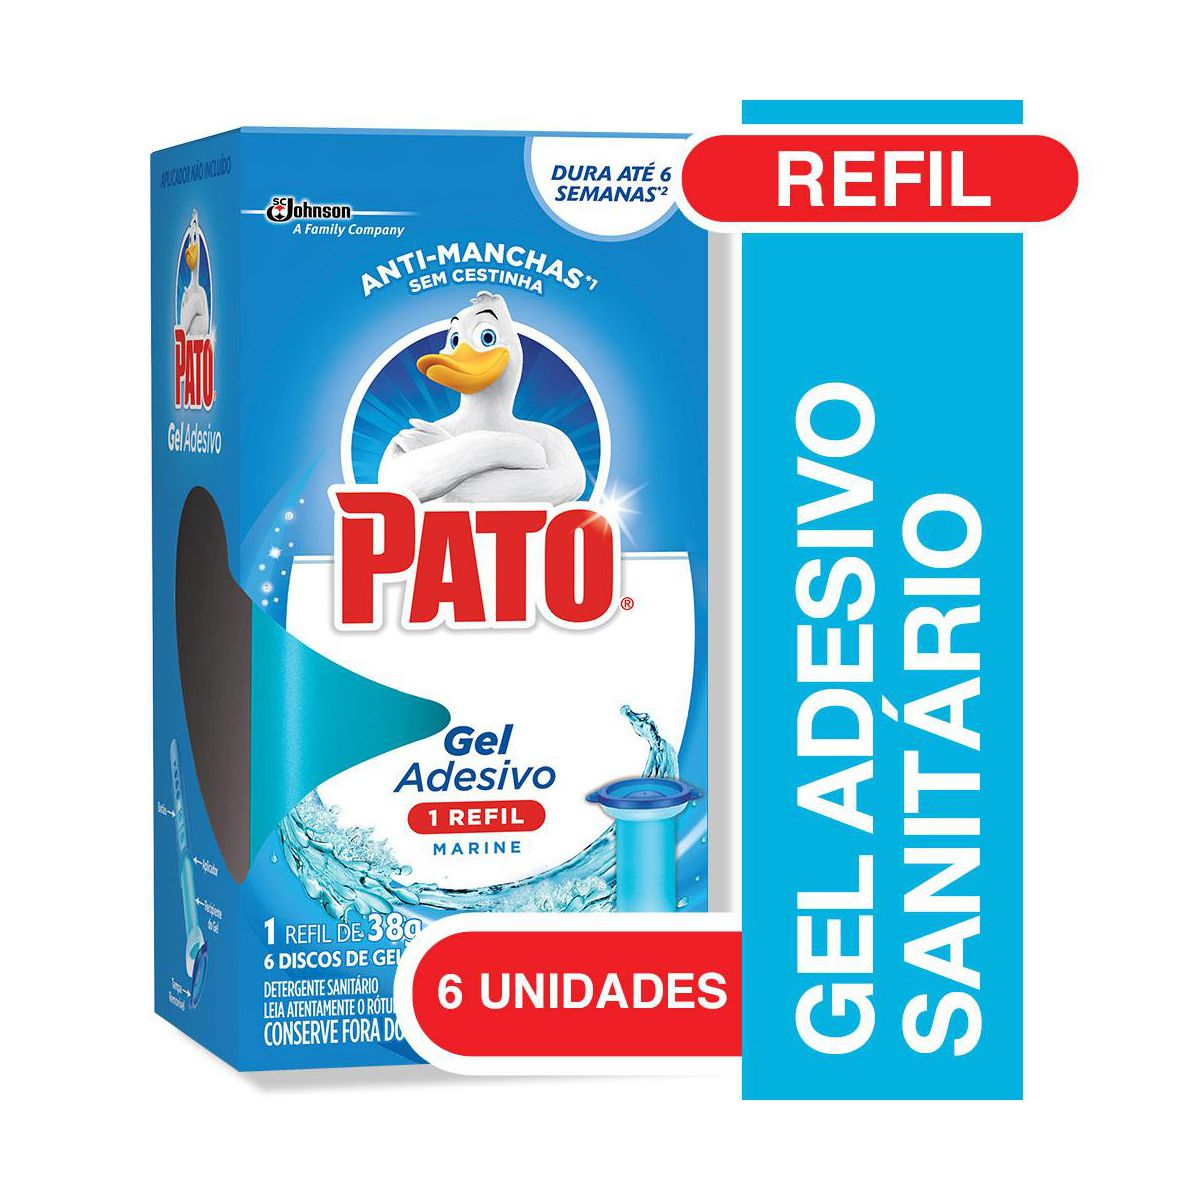 GEL SANITARIO ADESIVO MARINE REFIL 38G 6 DISCOS PATO